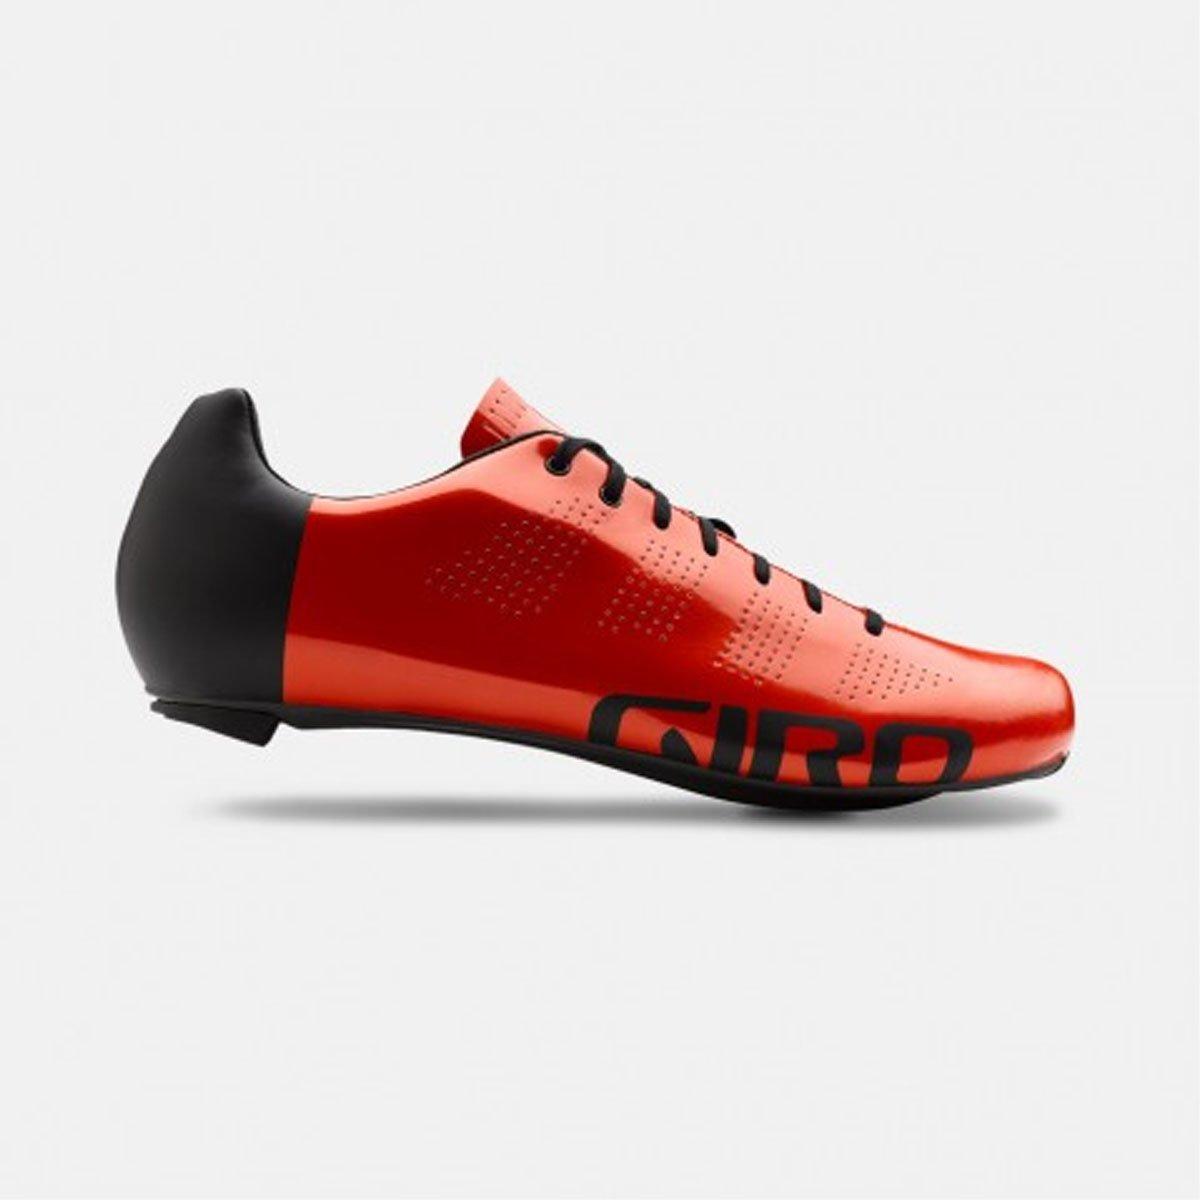 Giro Empire ACC Road Cycling Shoes B015T78CMG 45.5|Gloss Red/Black